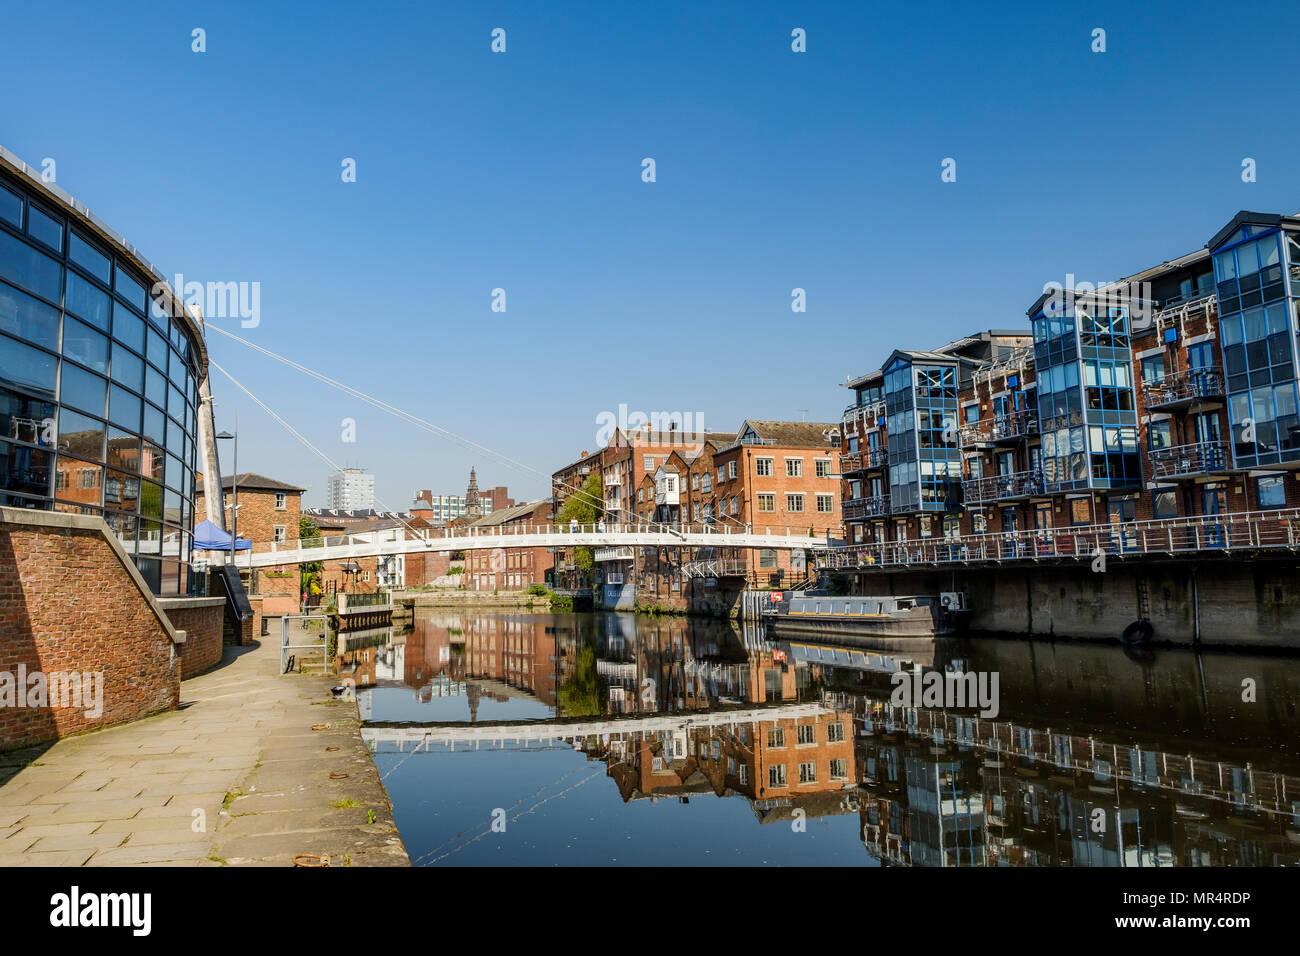 Brewery Wharf and Centenary Bridge, Leeds, West Yorkshire